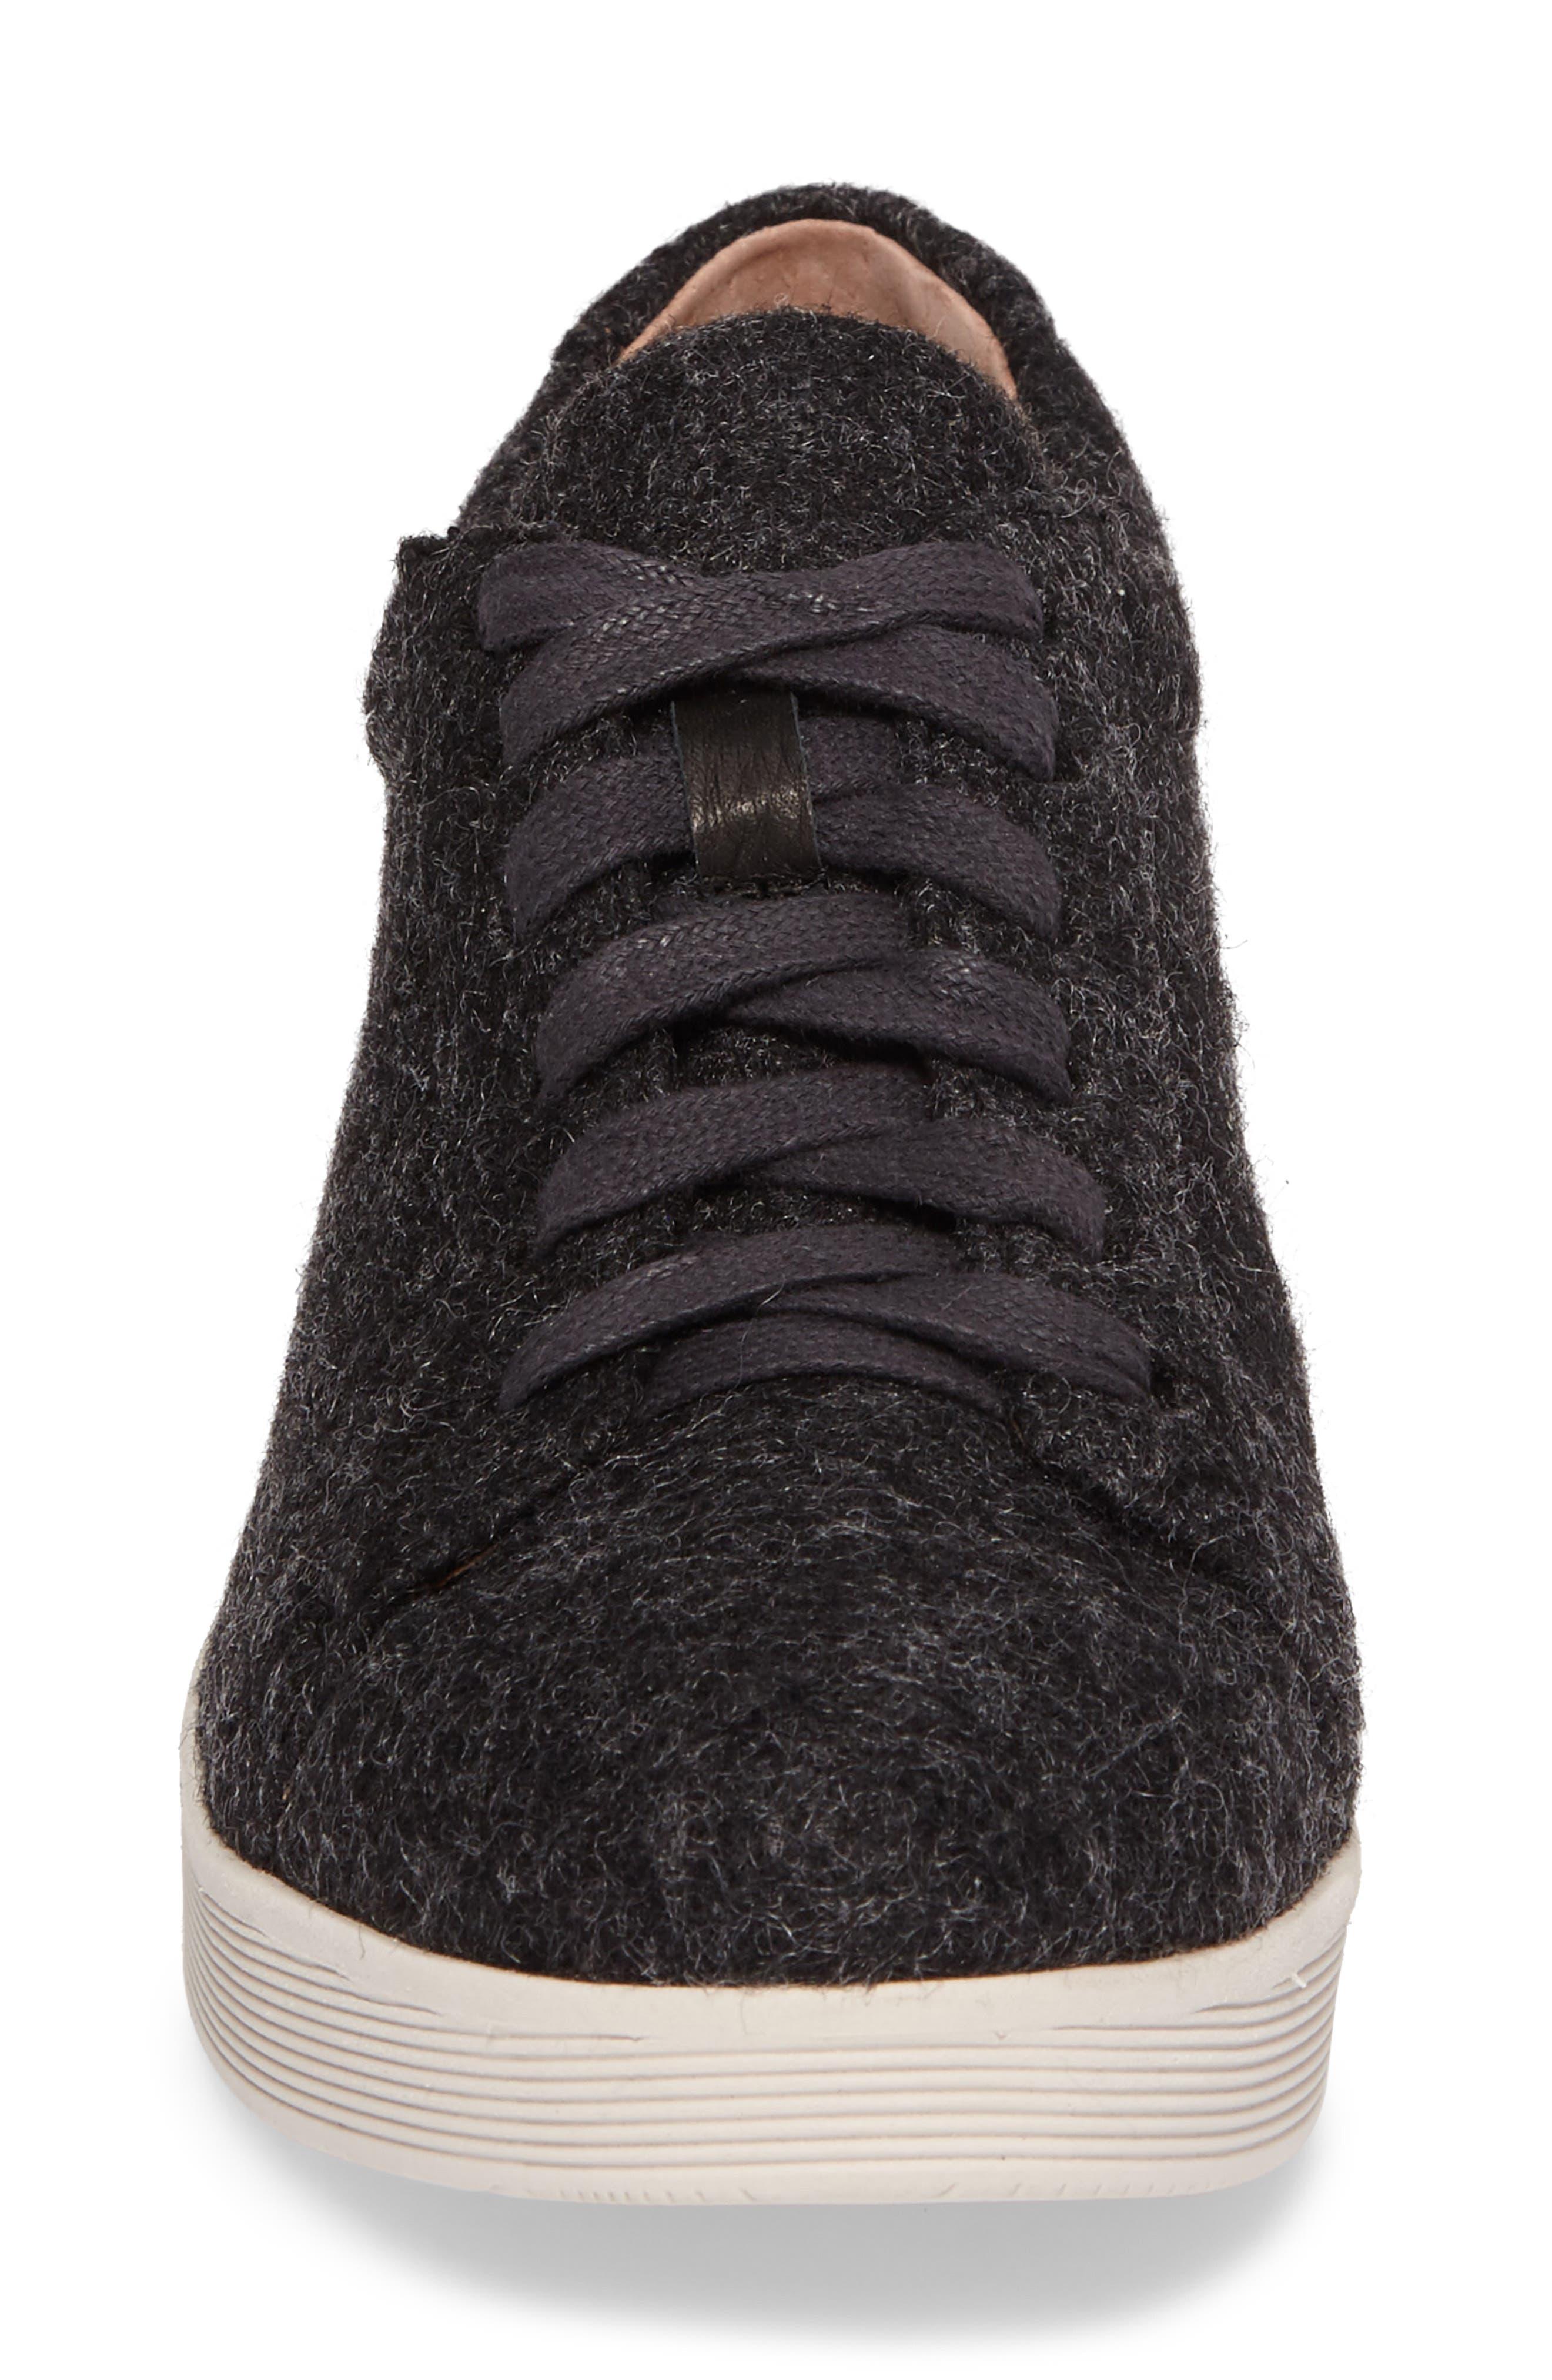 GENTLE SOULS BY KENNETH COLE, Haddie Low Platform Sneaker, Alternate thumbnail 4, color, HEATHER GREY WOOL